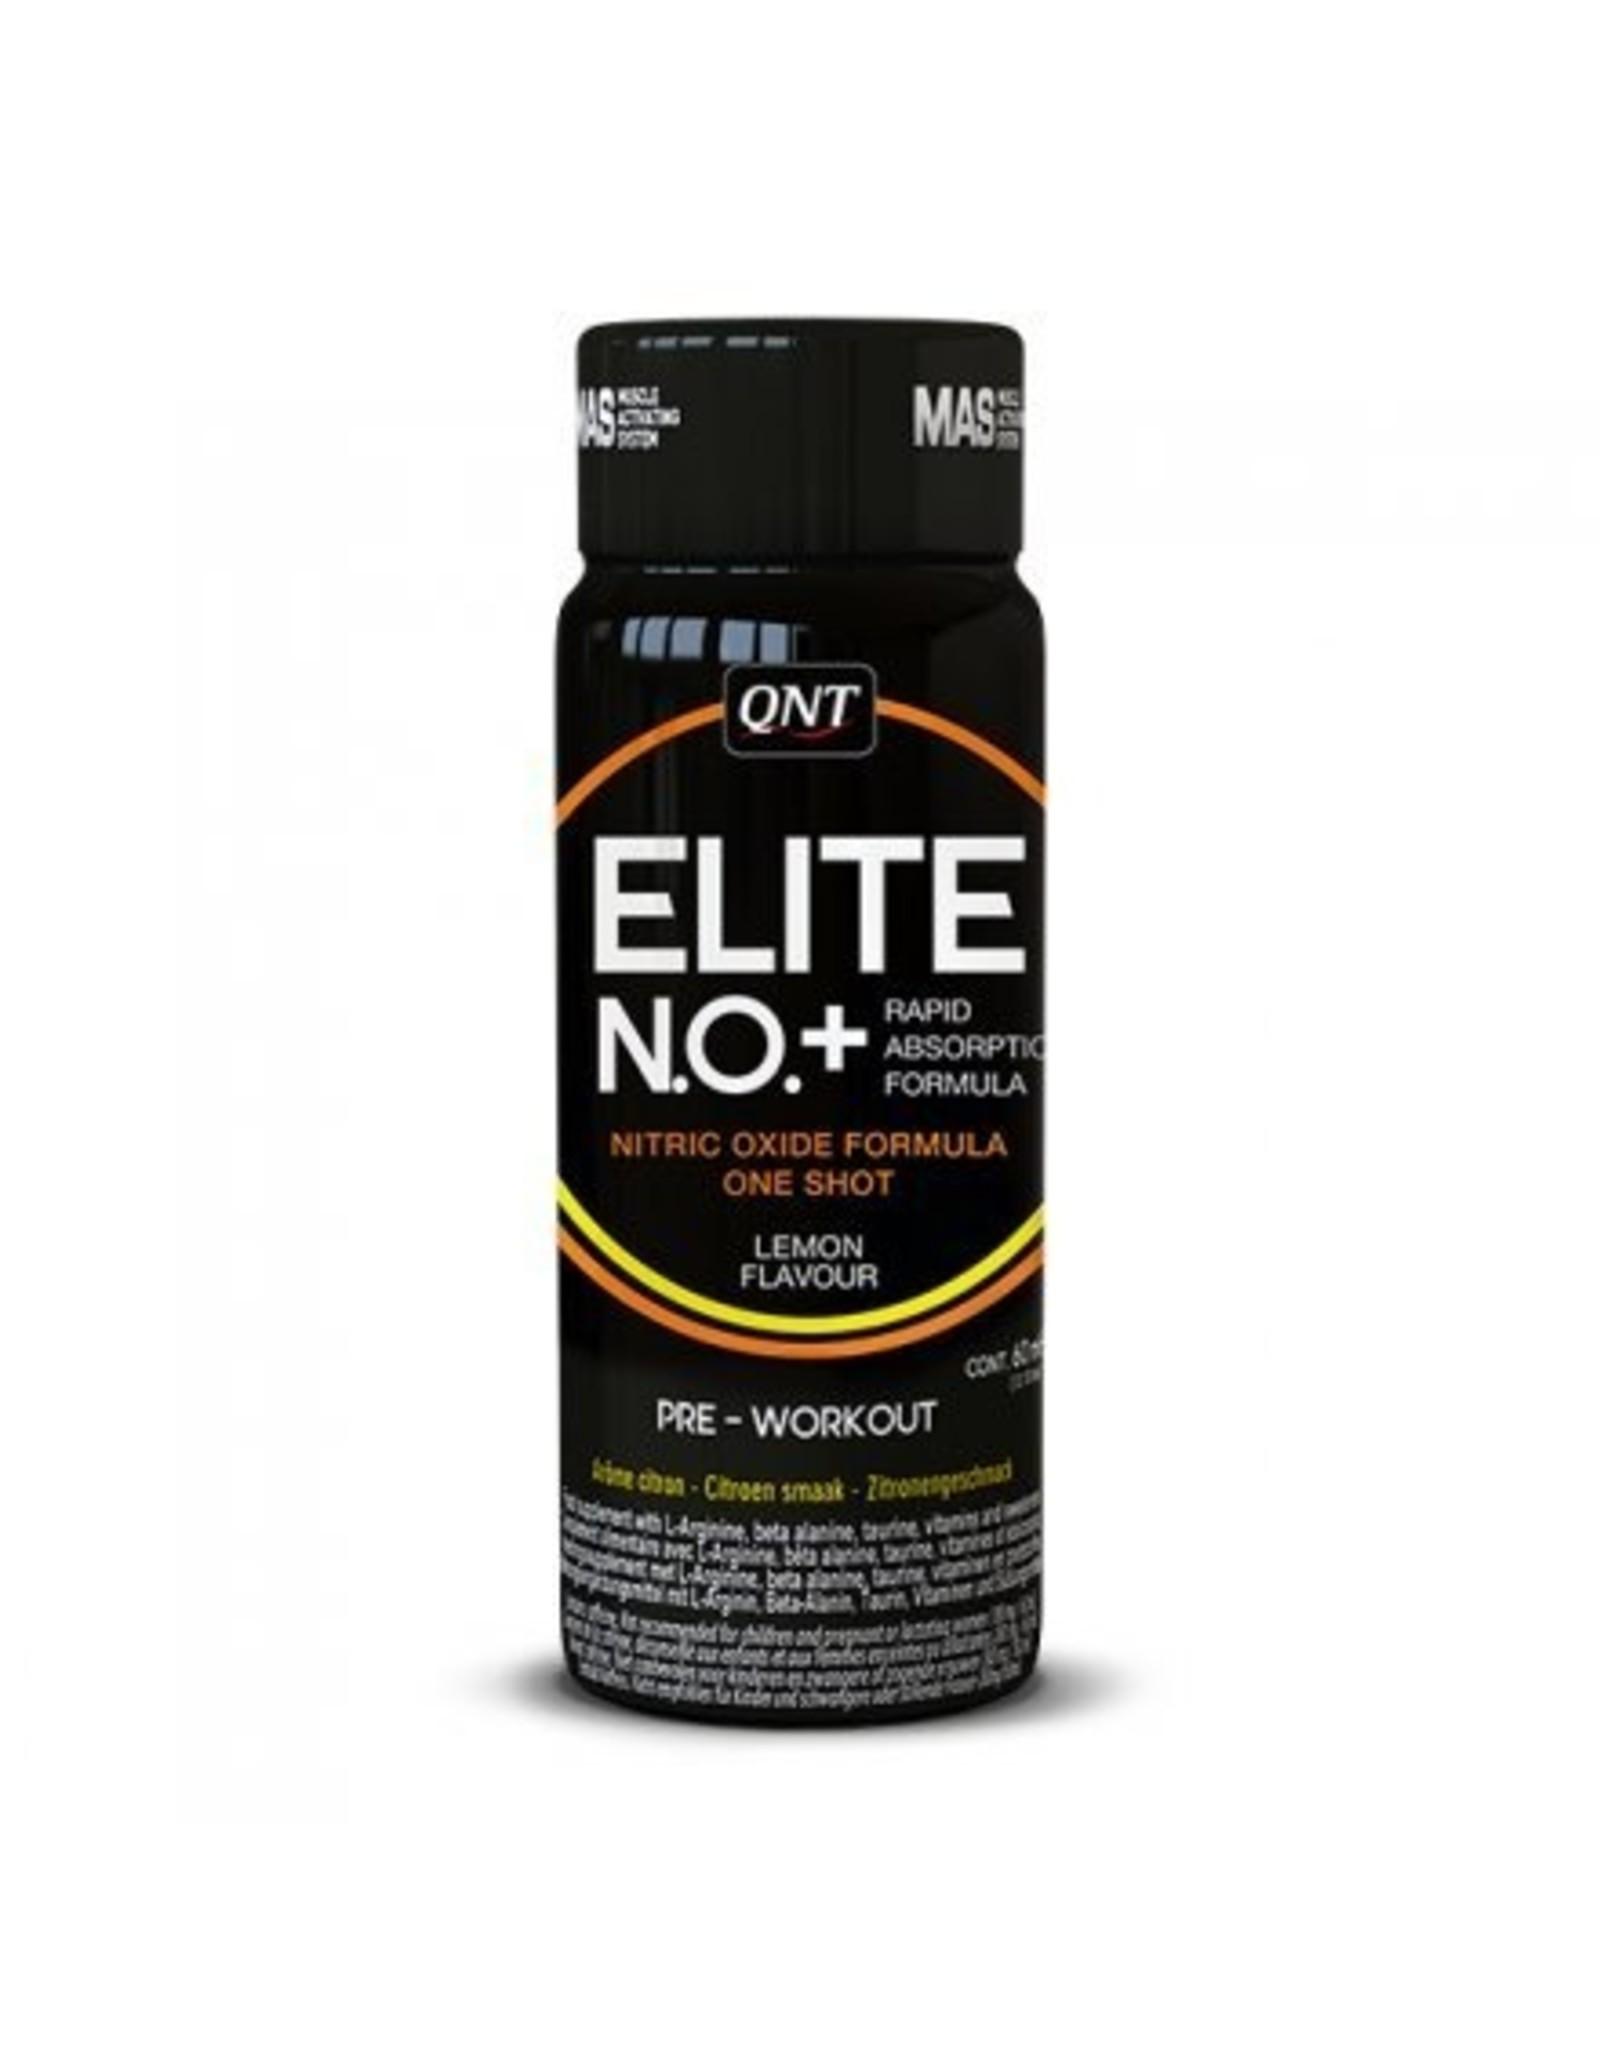 QNT NO+ Elite Shot